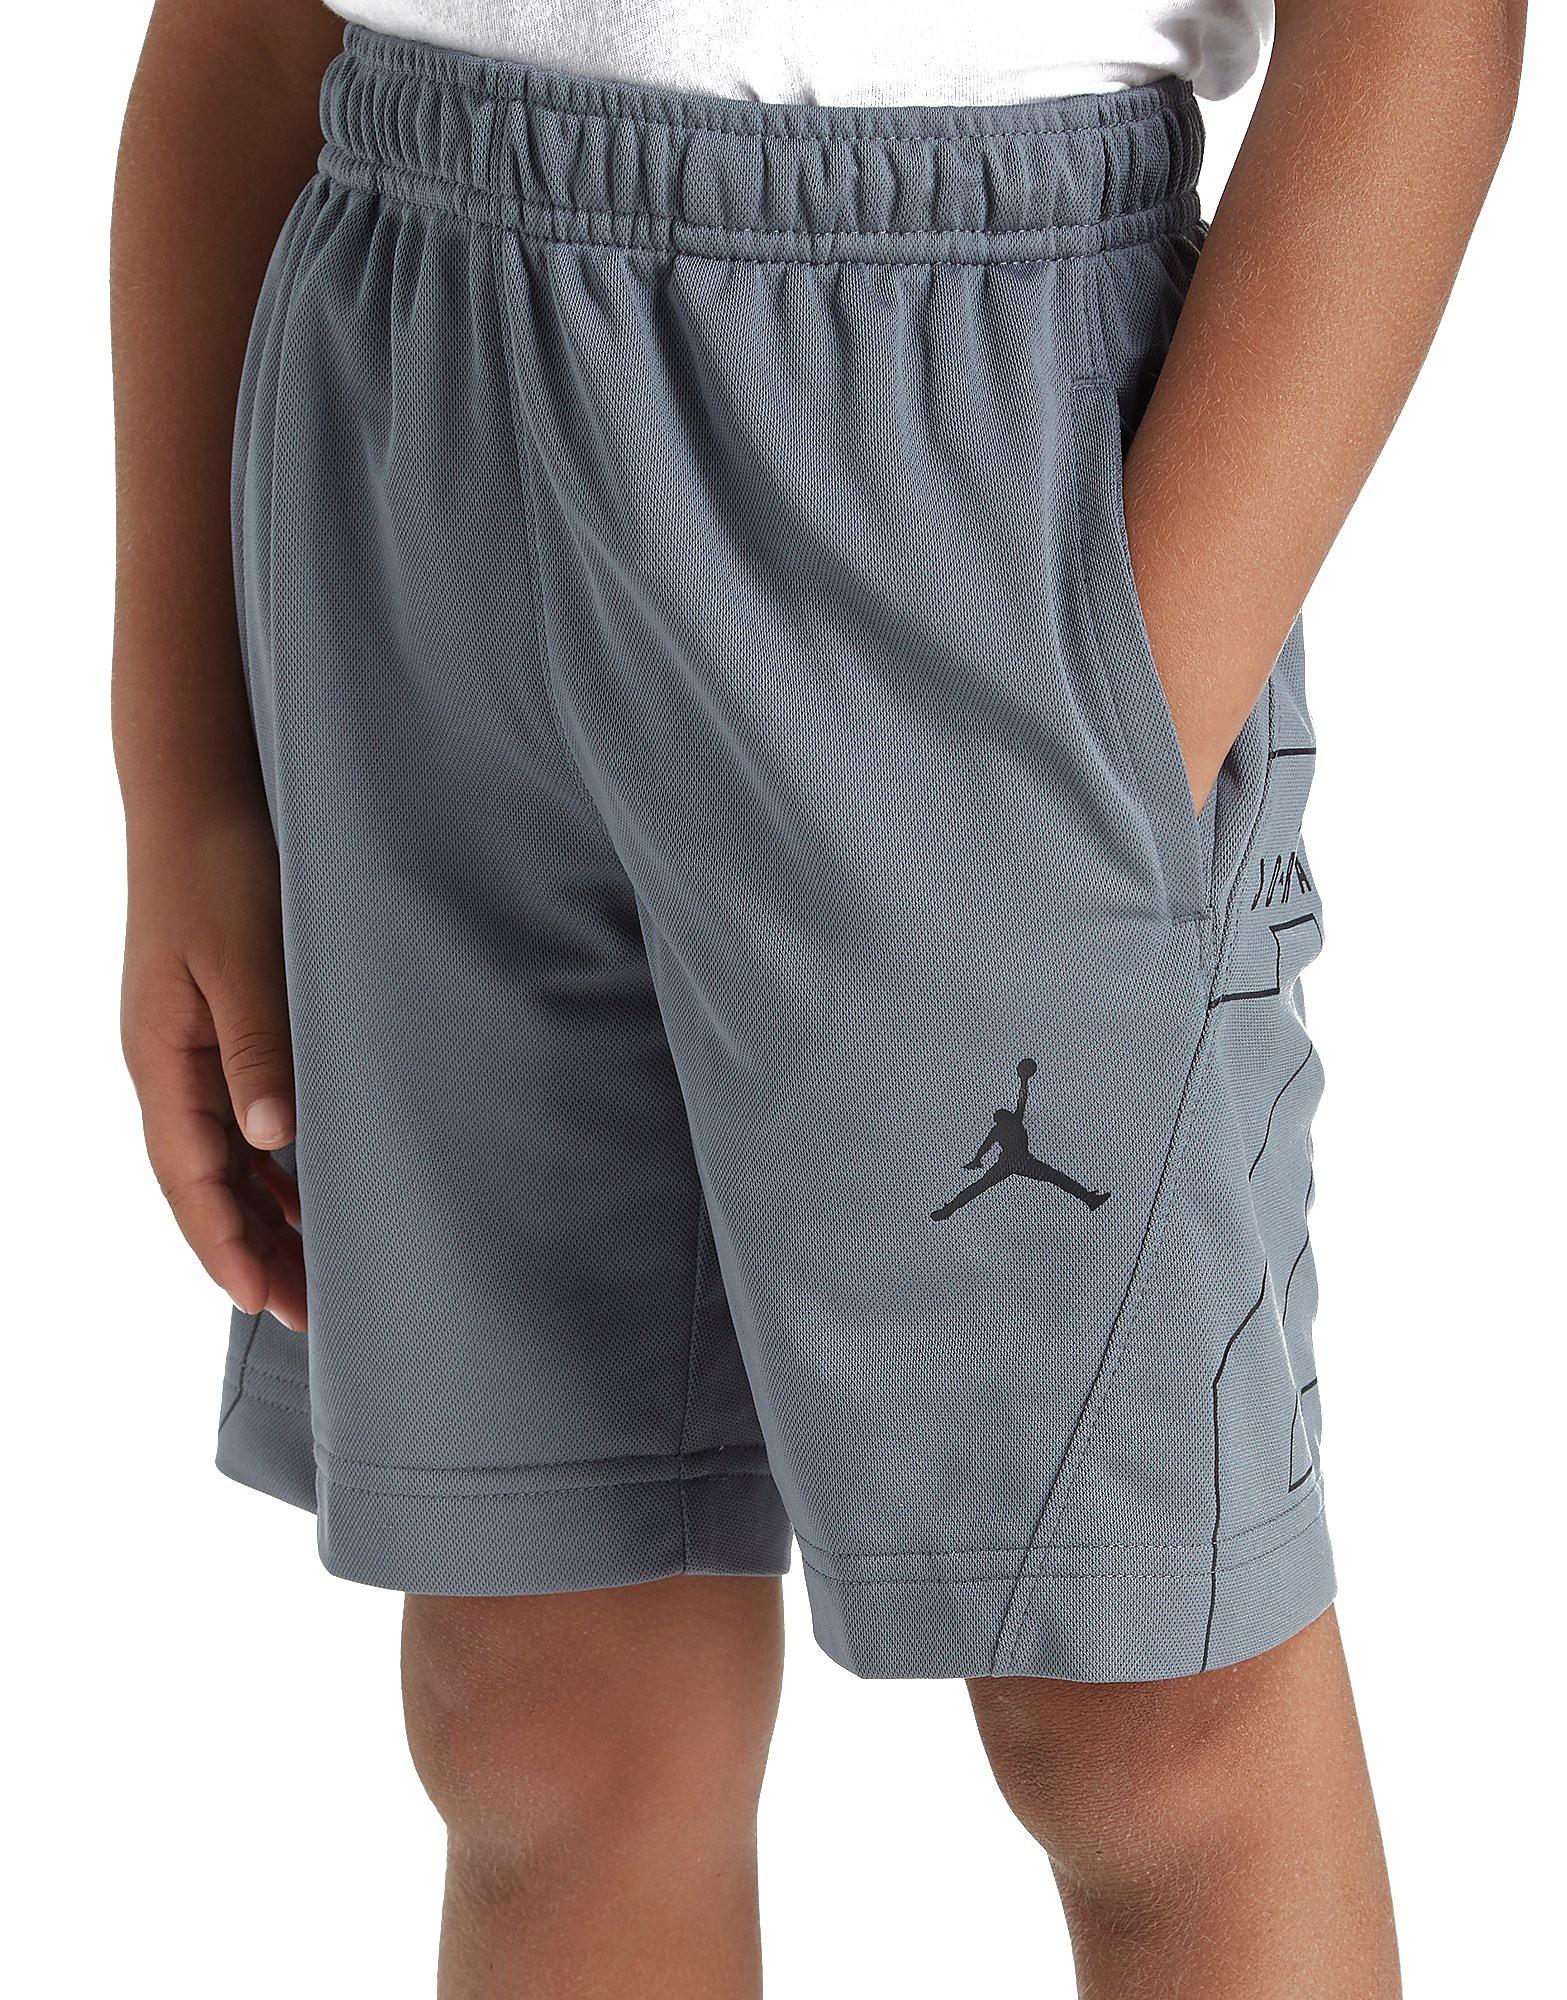 Jordan 23 Shorts Kinder